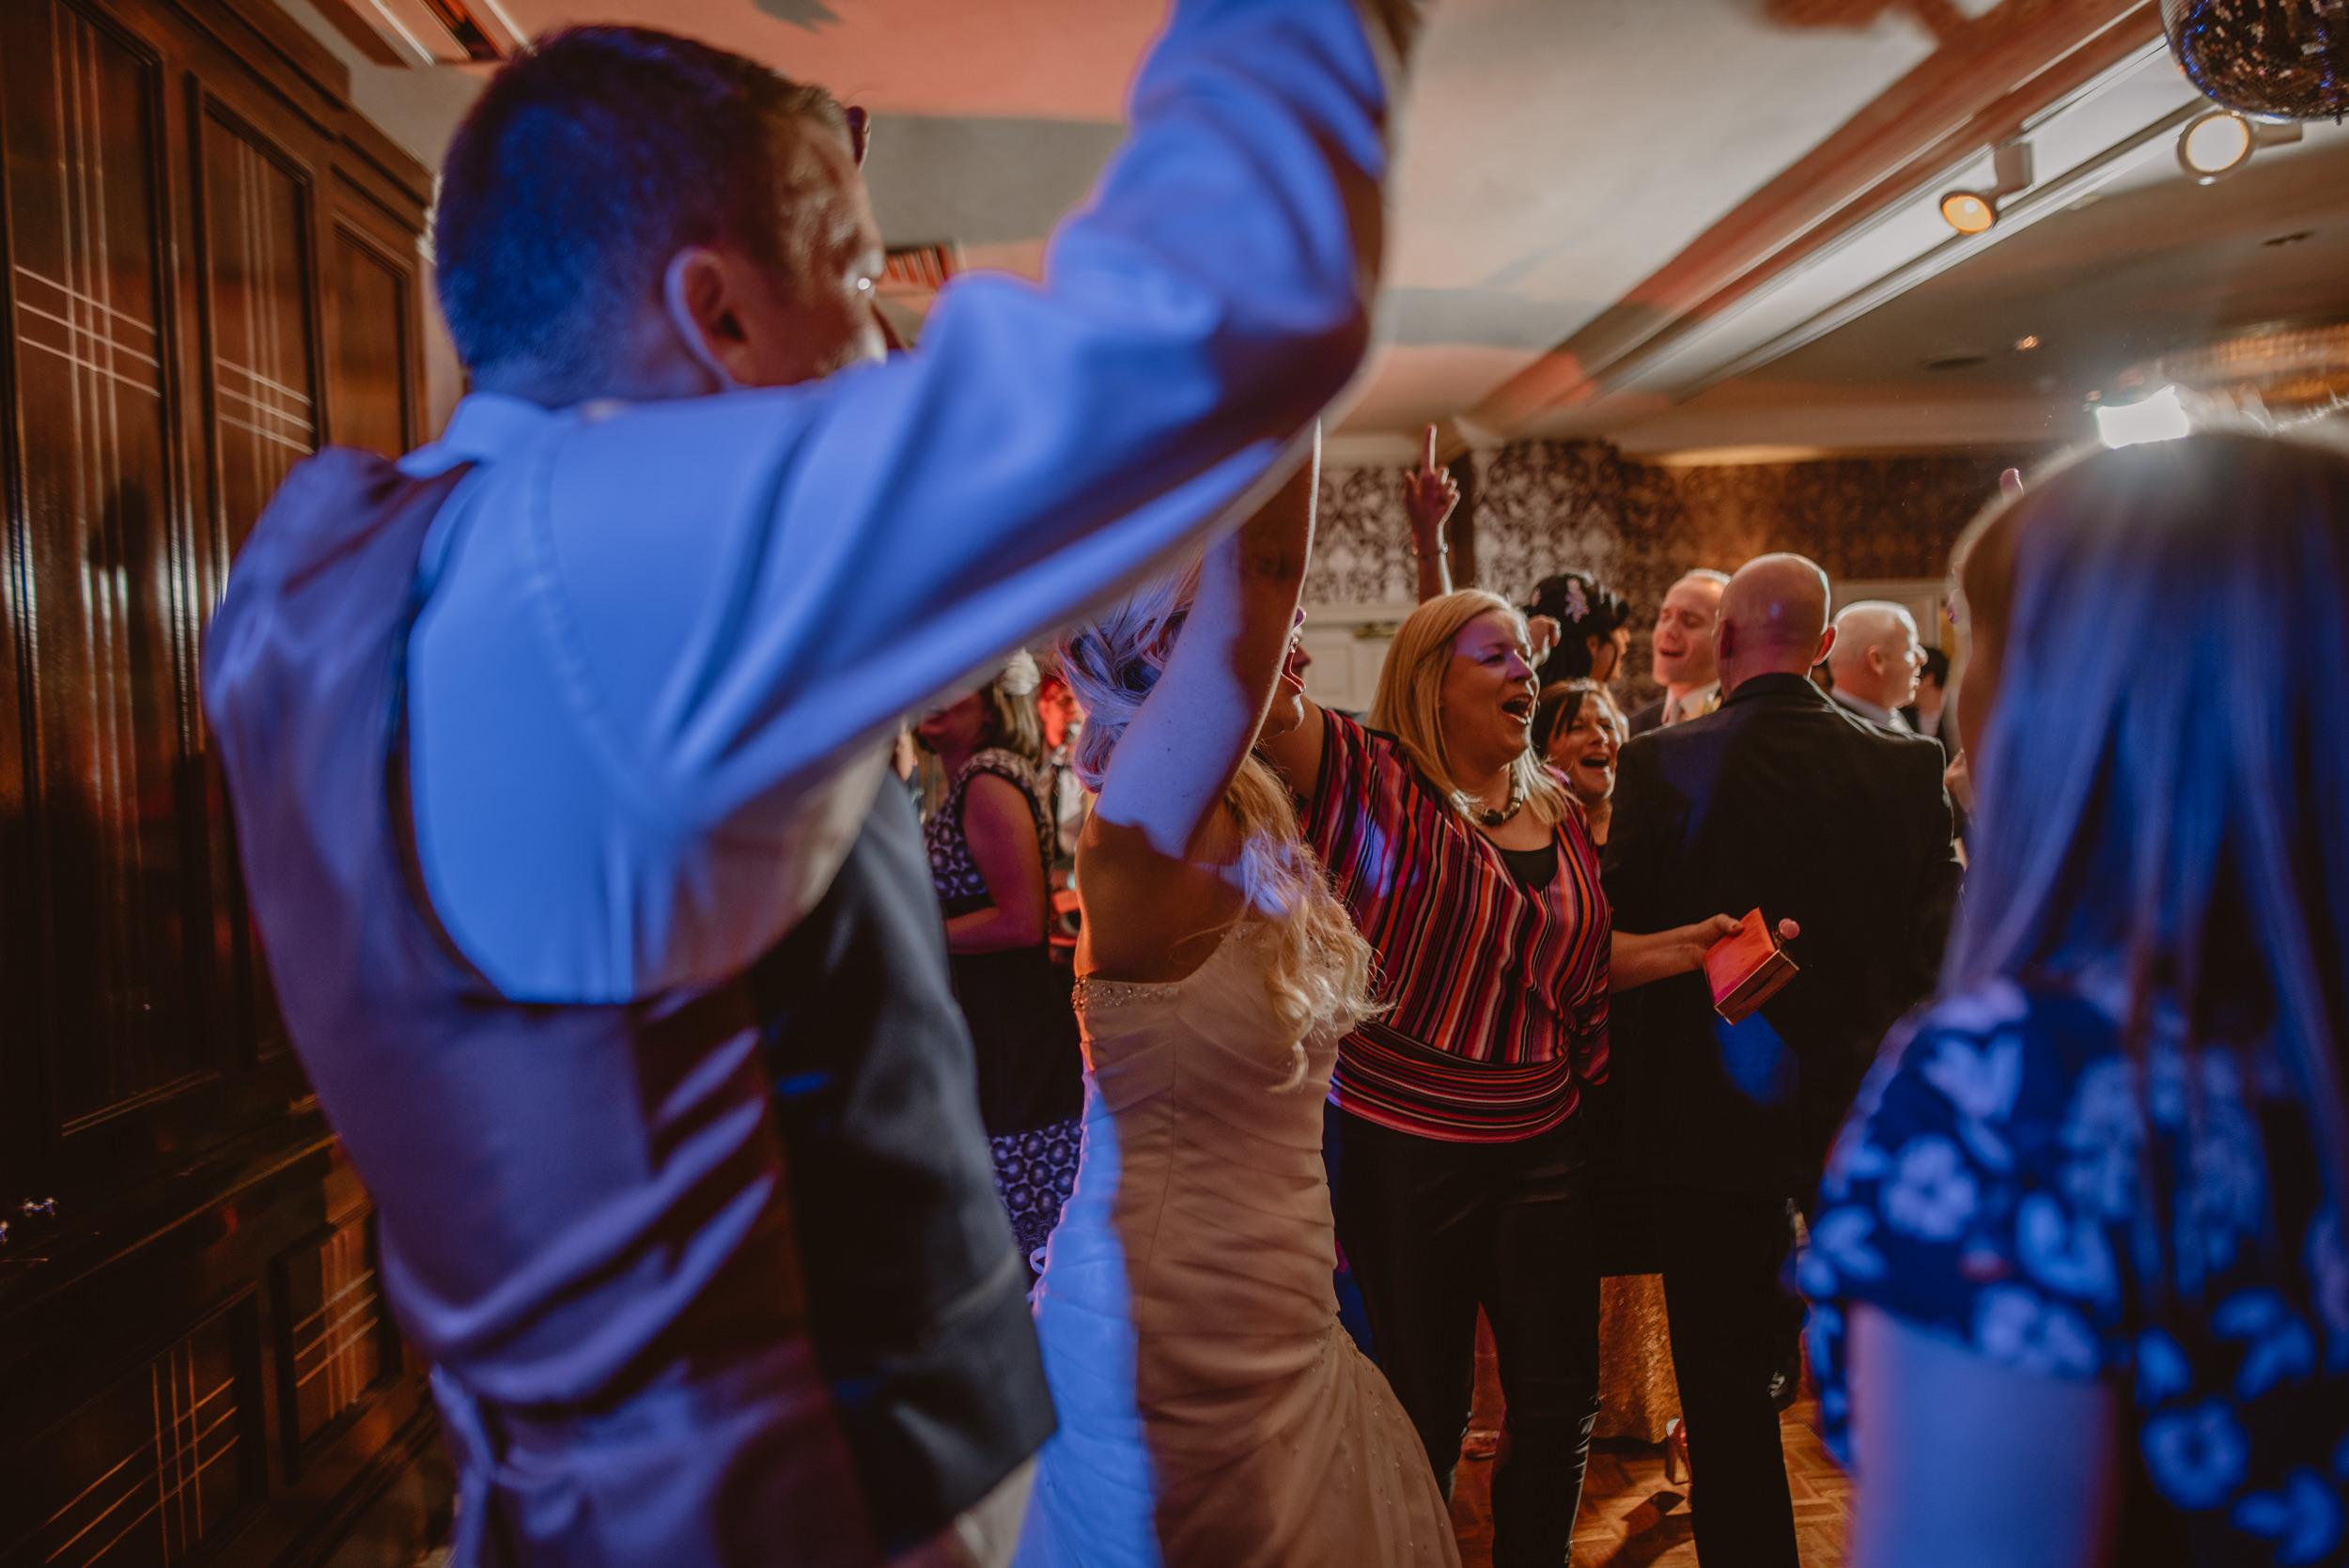 Trisha-and-Roger-wedding-The-Priory-Church-and-Chewton-Glen-Hotel-Christchurch-Manu-Mendoza-Wedding-Photography-525.jpg